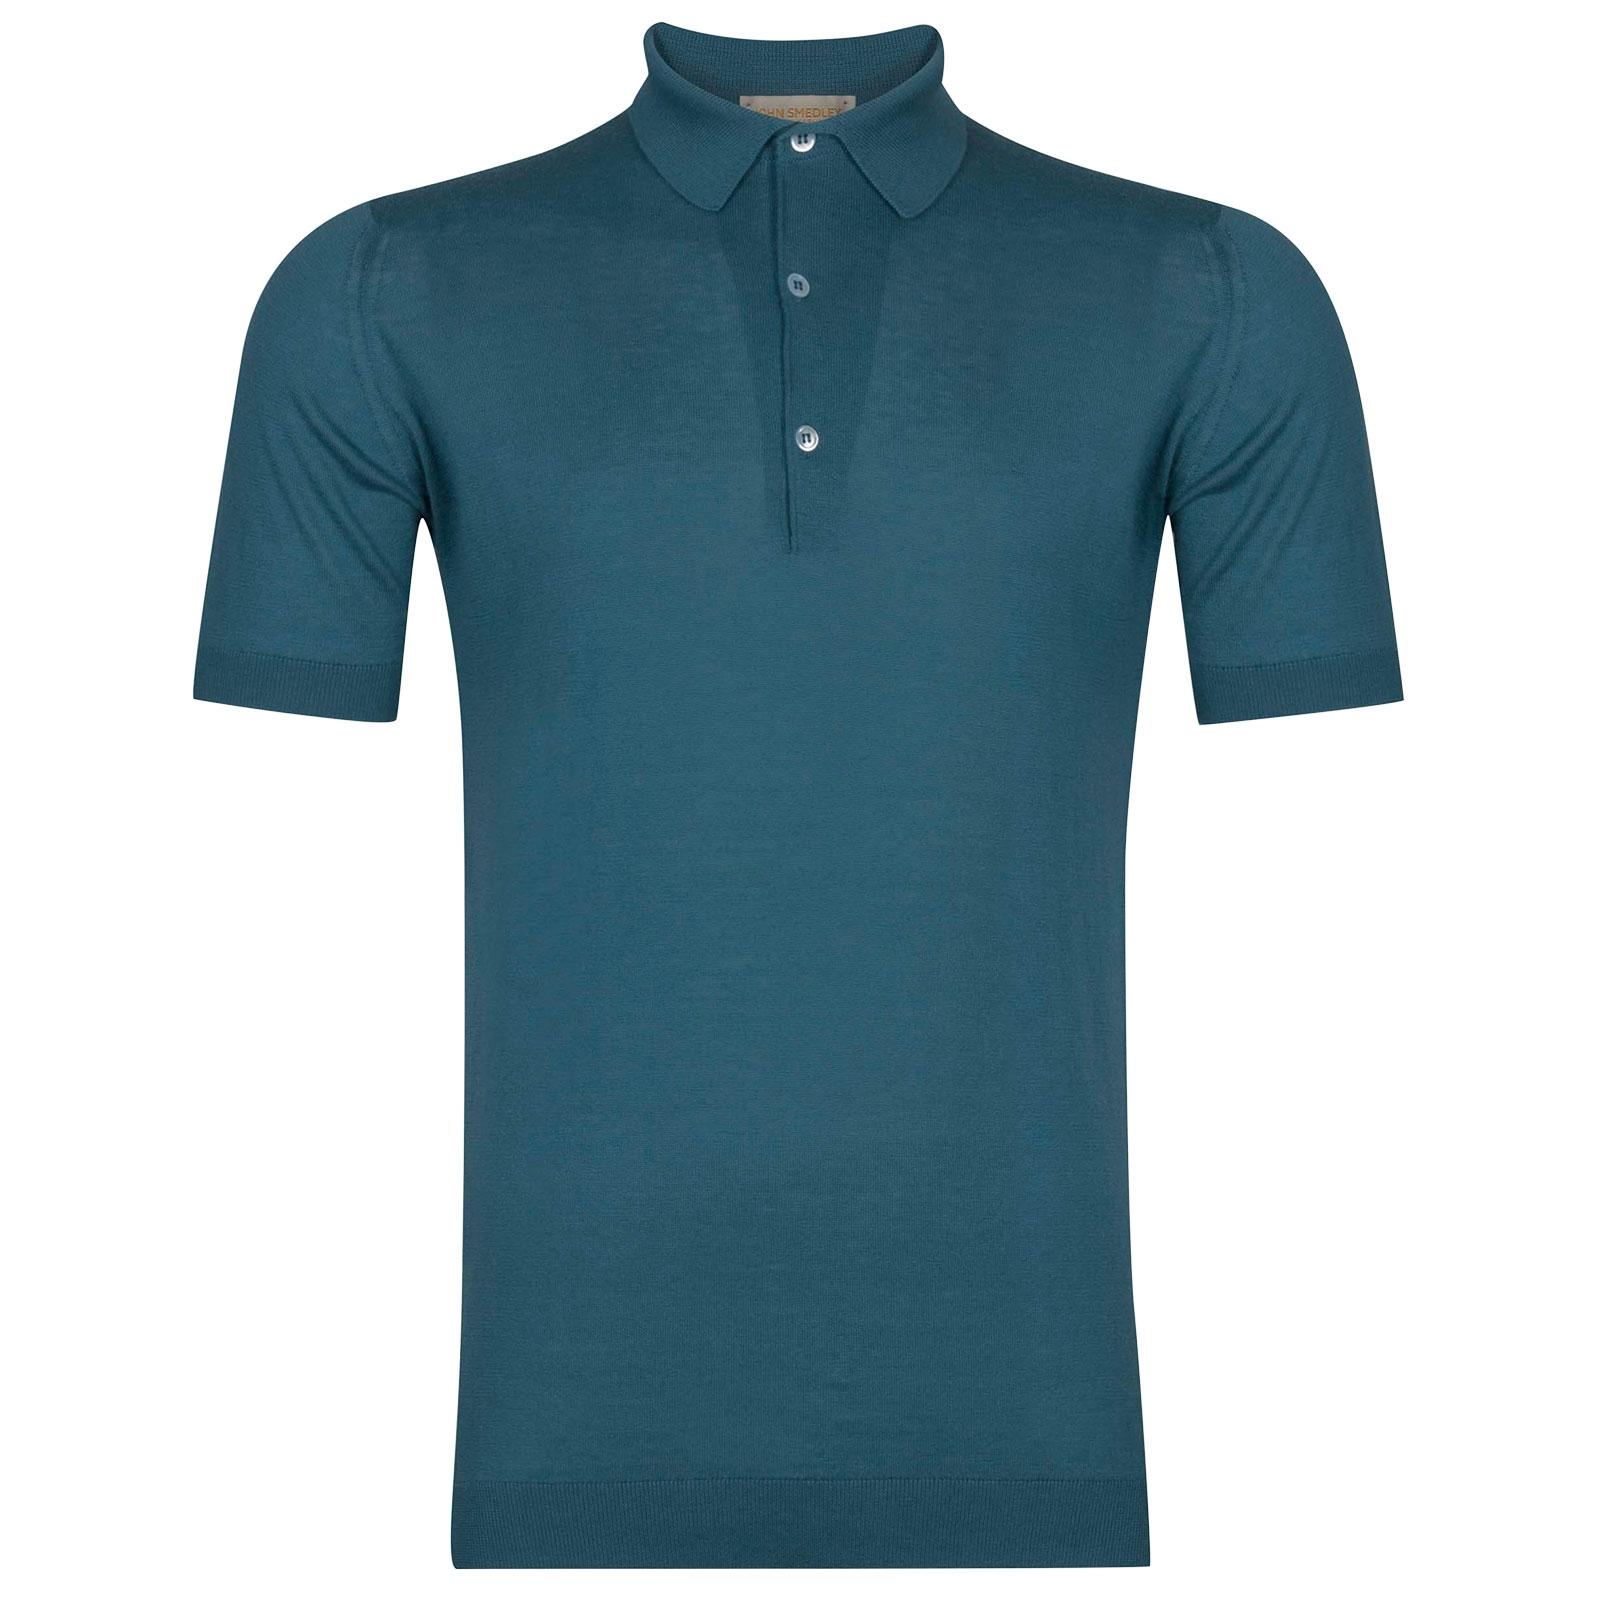 John Smedley Haddon Sea Island Cotton and Cashmere Shirt in Bias